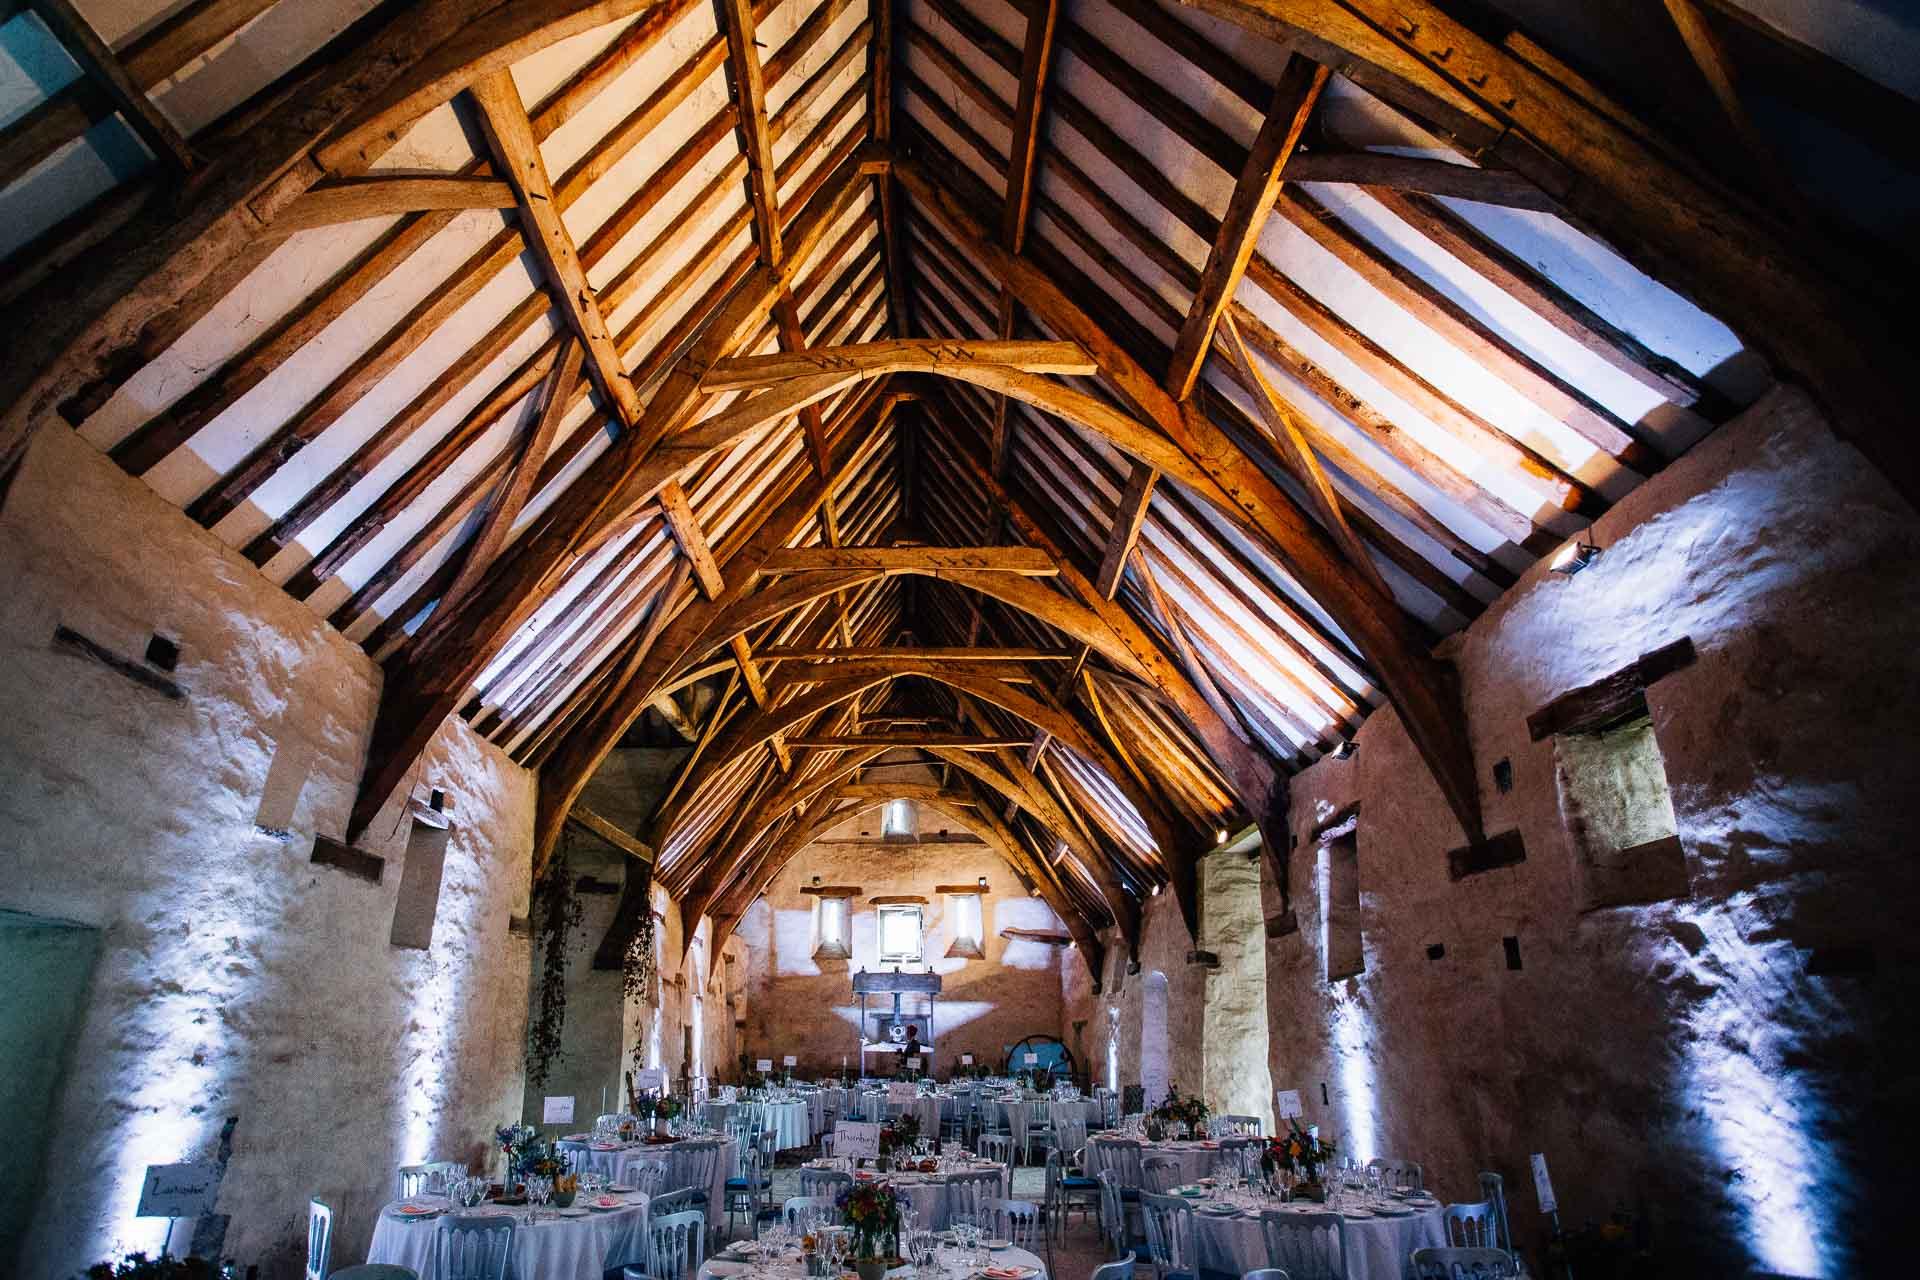 winterbourne-medieval-barn-wedding-photography-emma-andrew-72